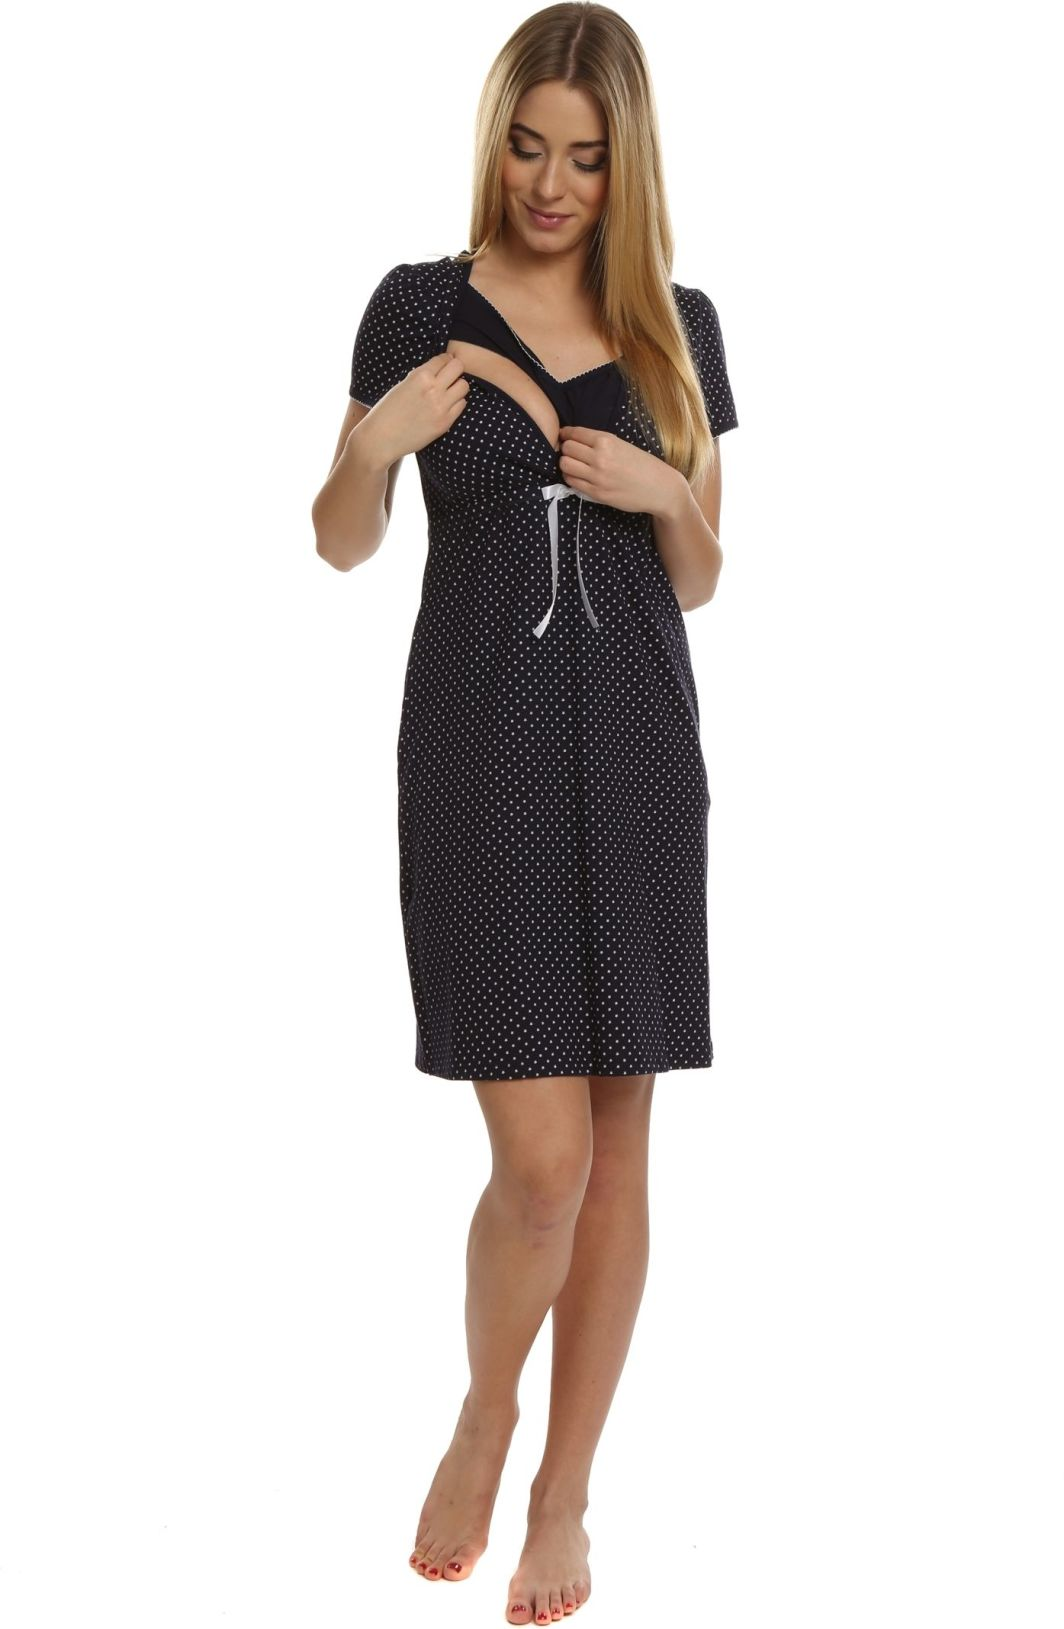 Italian fashion Koszula nocna radość granatowa r. XL 1